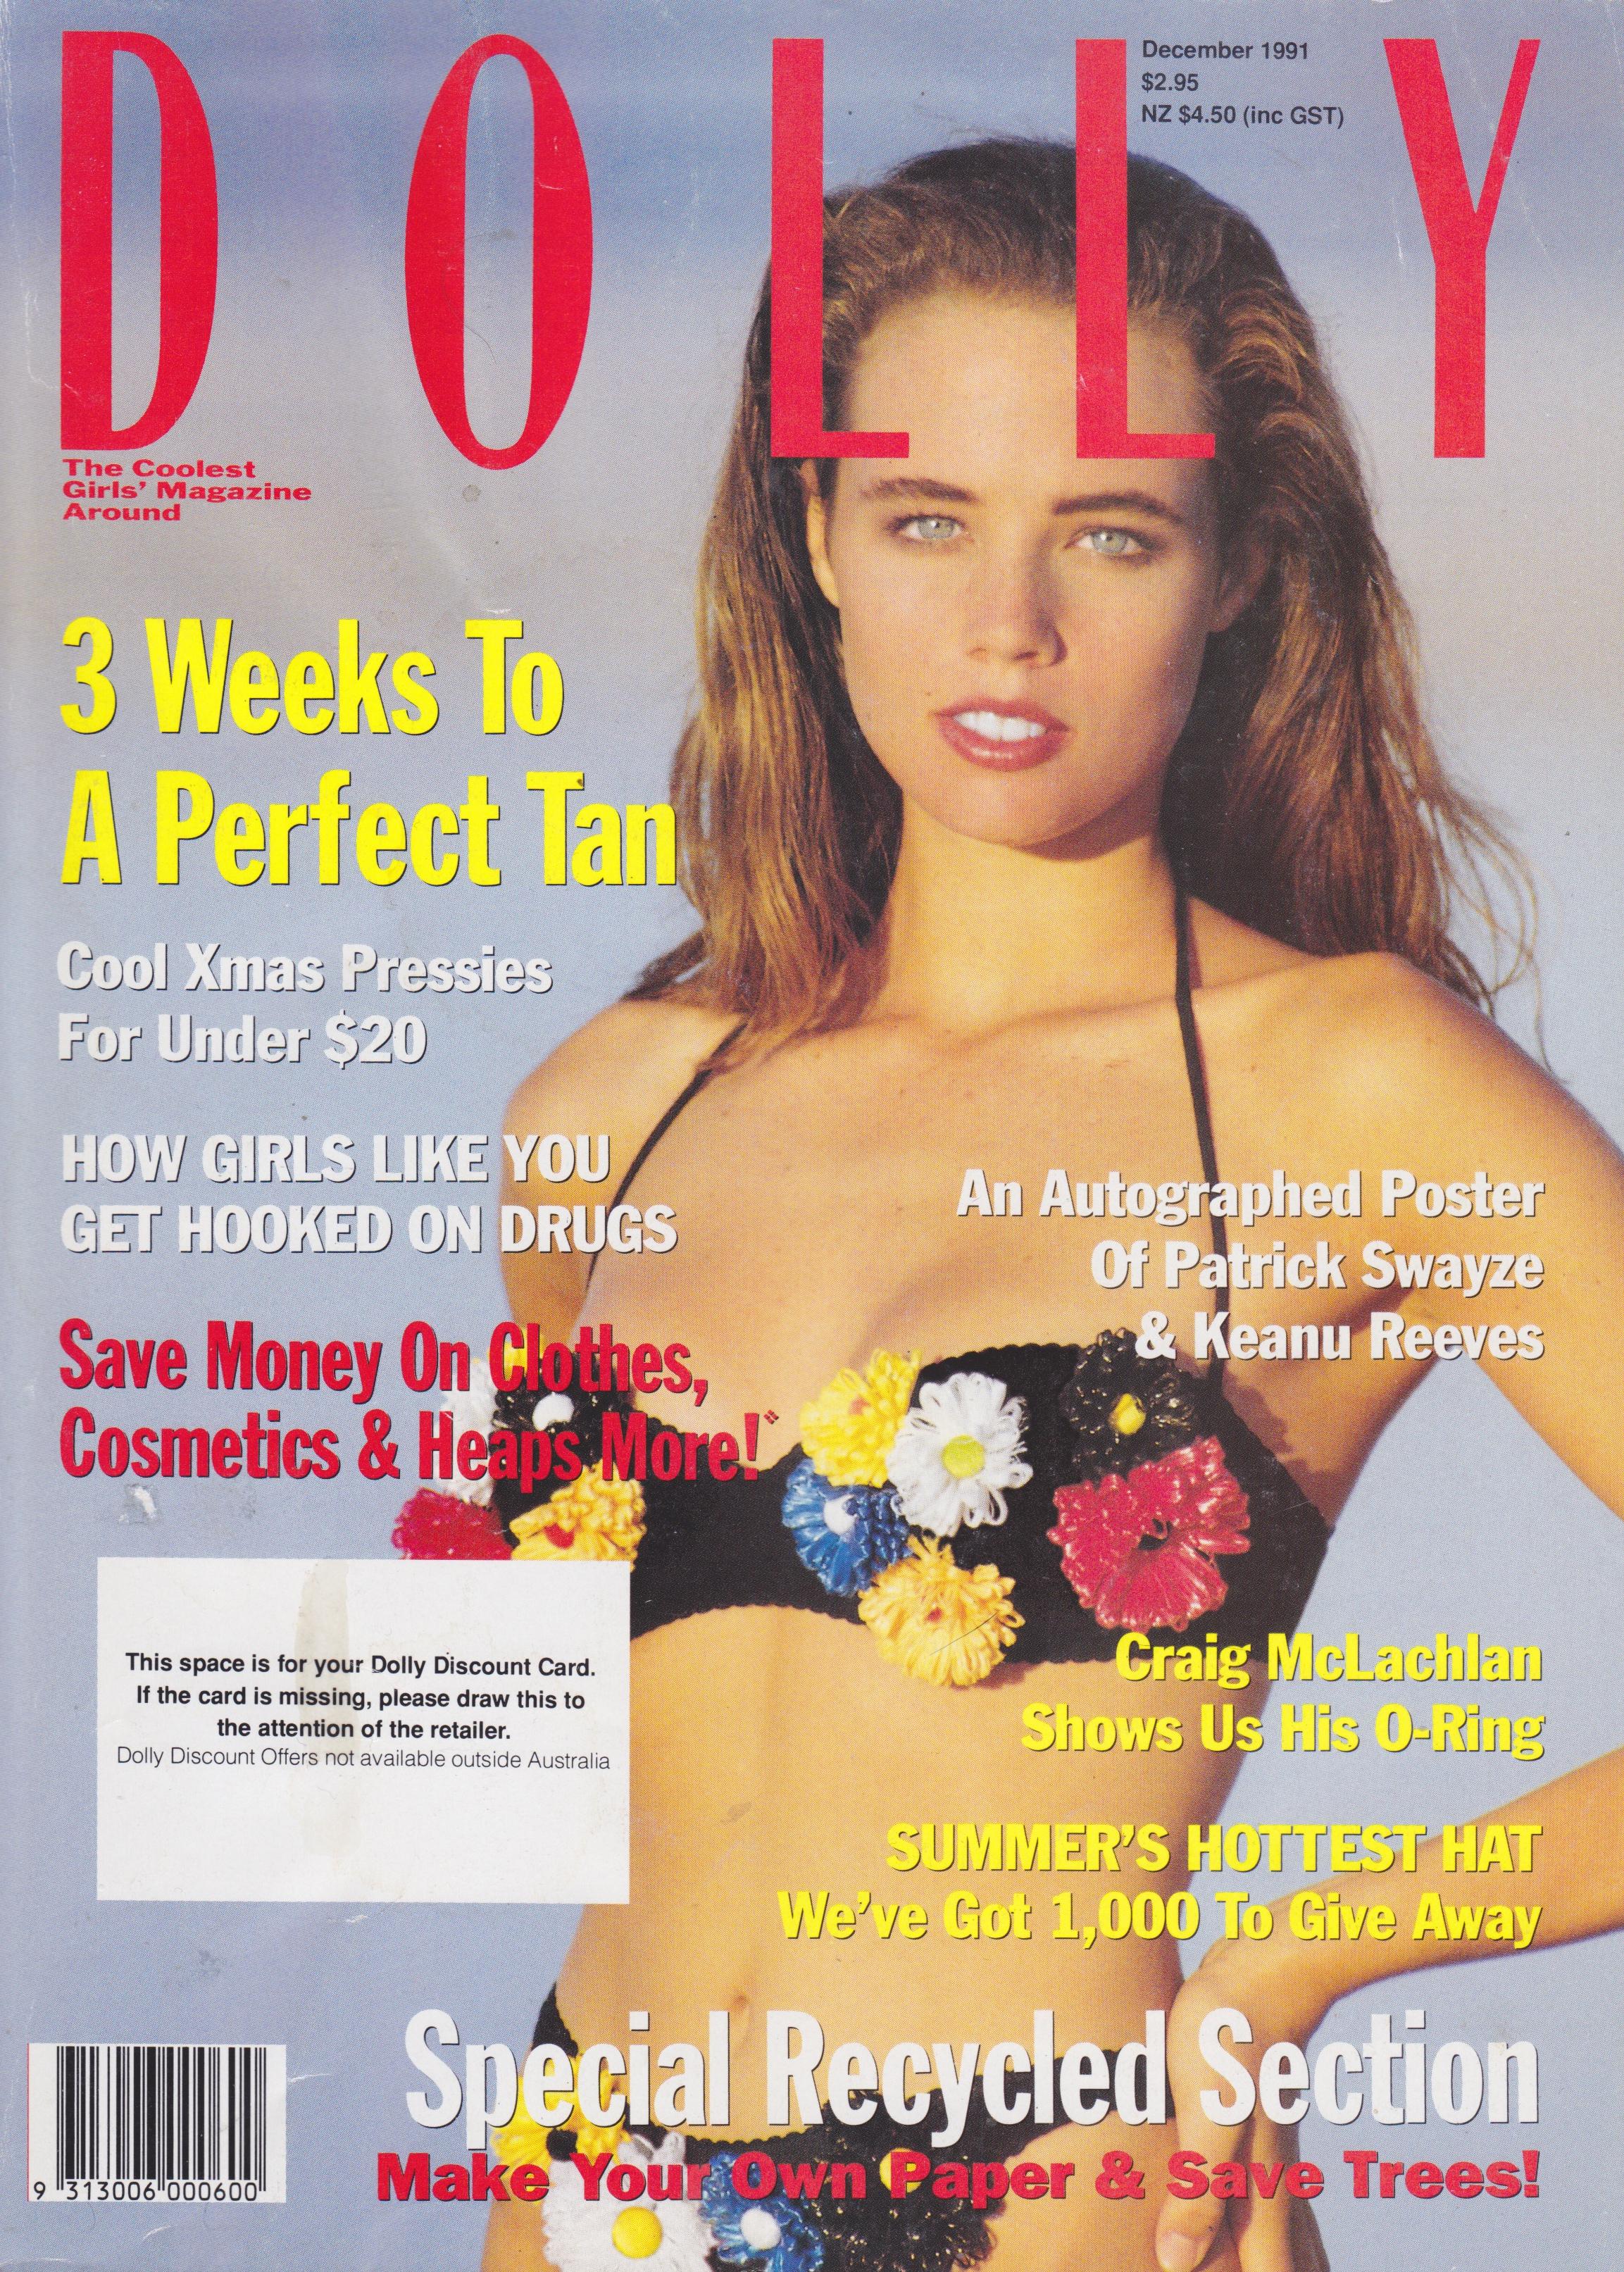 Dolly December 1991